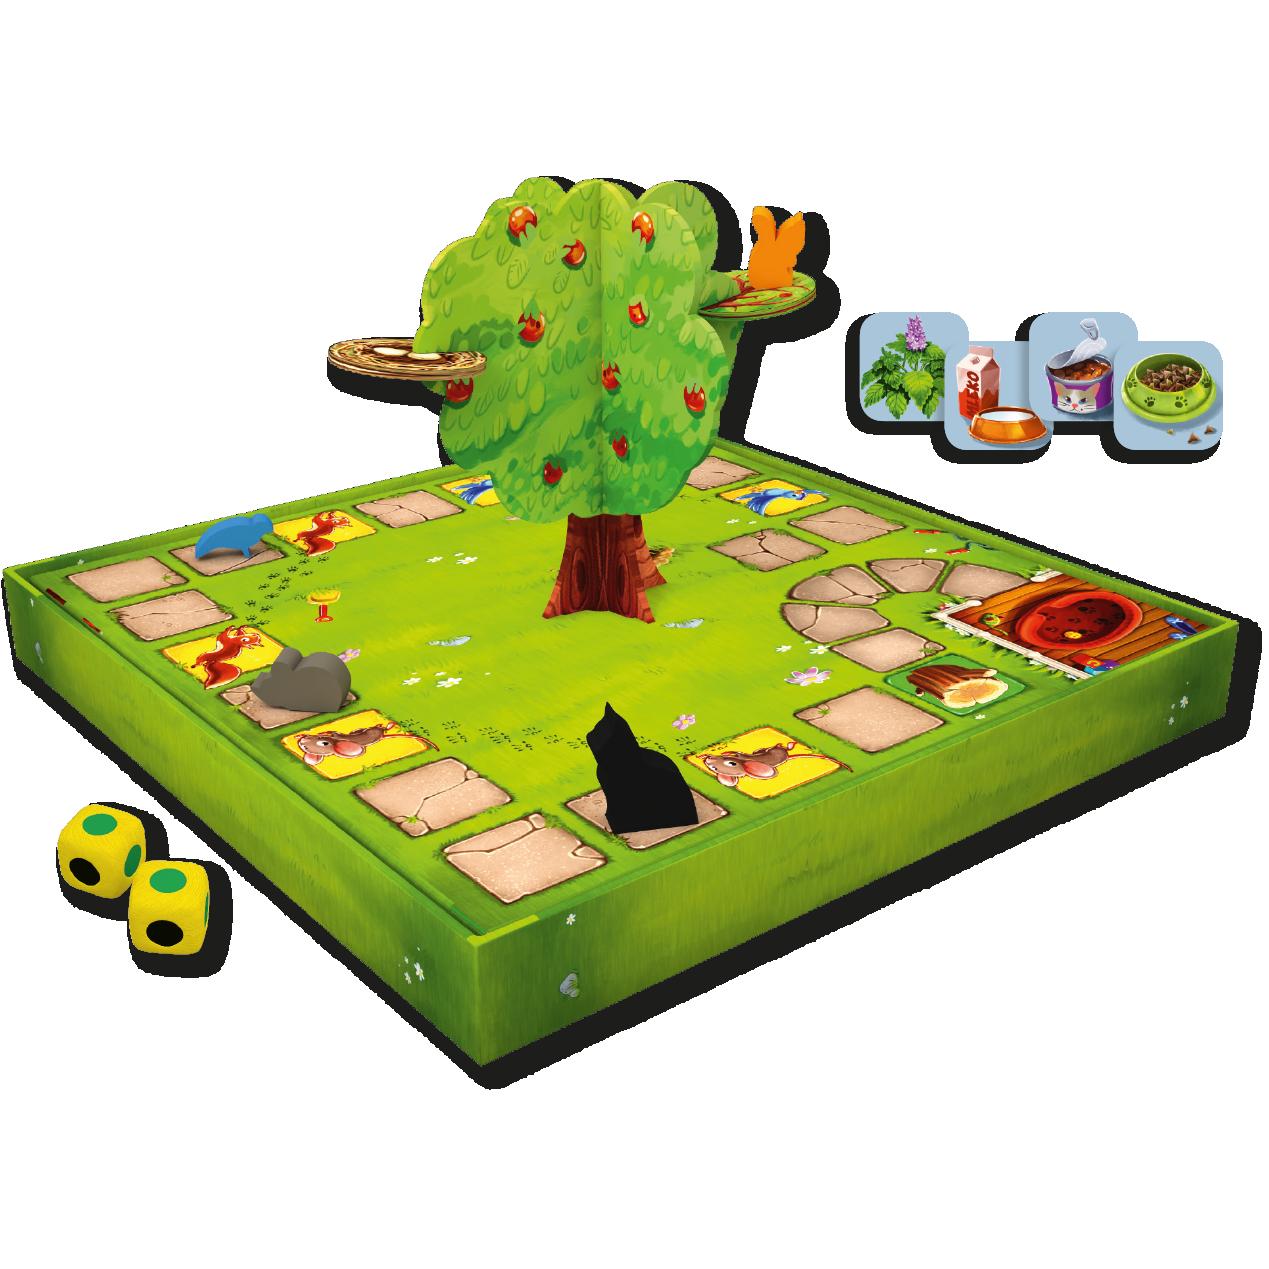 Max motanul - Joc Board Game cooperativ pentru copii - Sunny Games 2